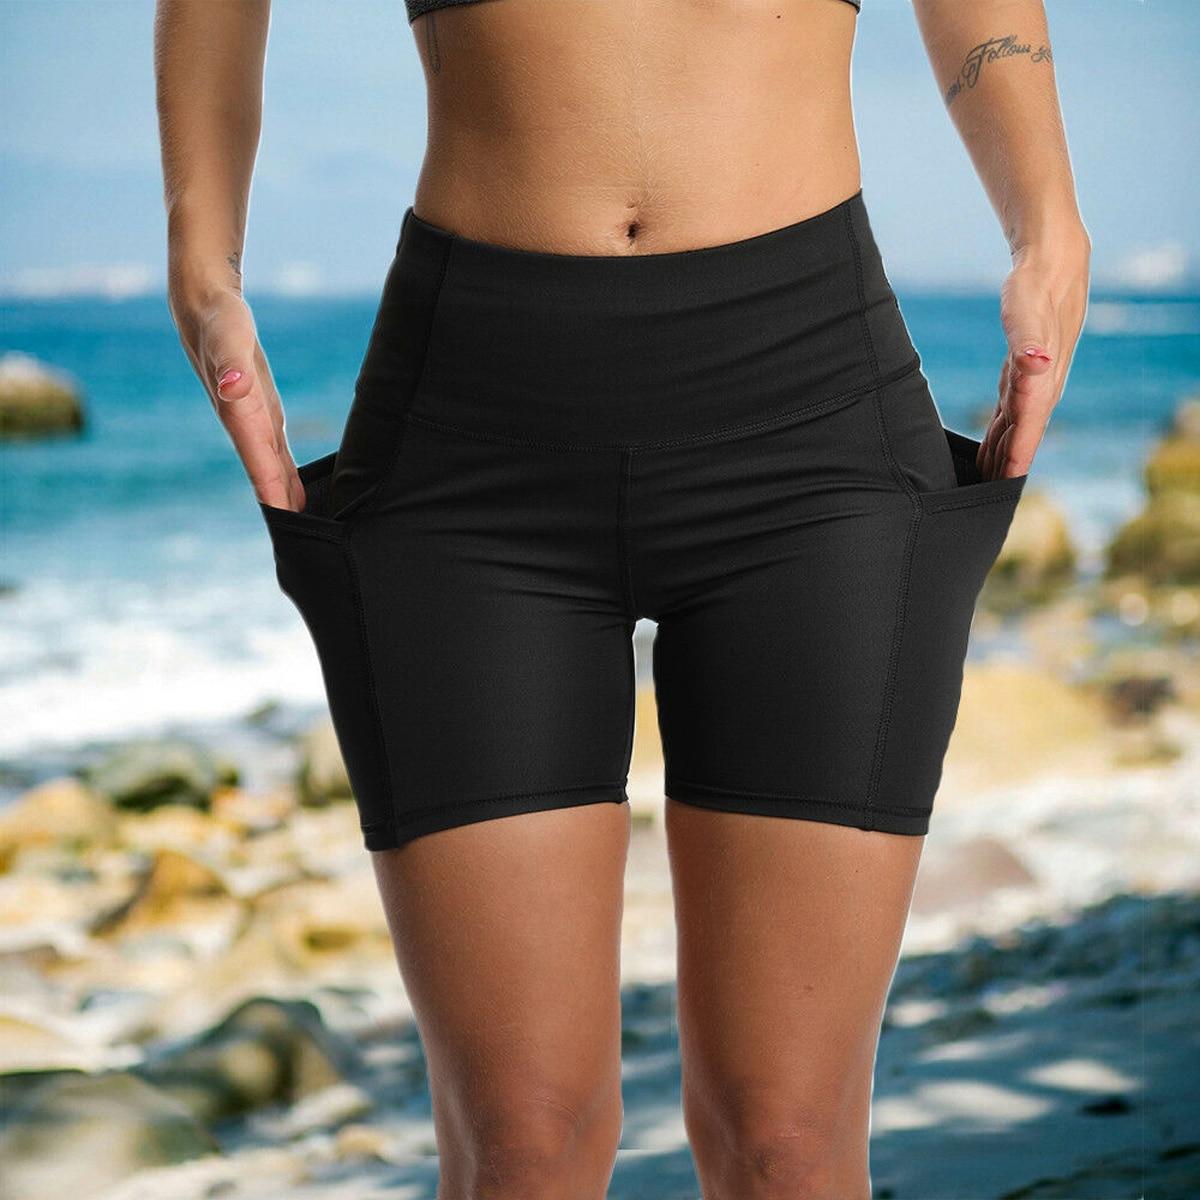 Women's High Waist Sports Short Workout Running Fitness Leggings Female Shorts Gym Leggings With Side Pocket